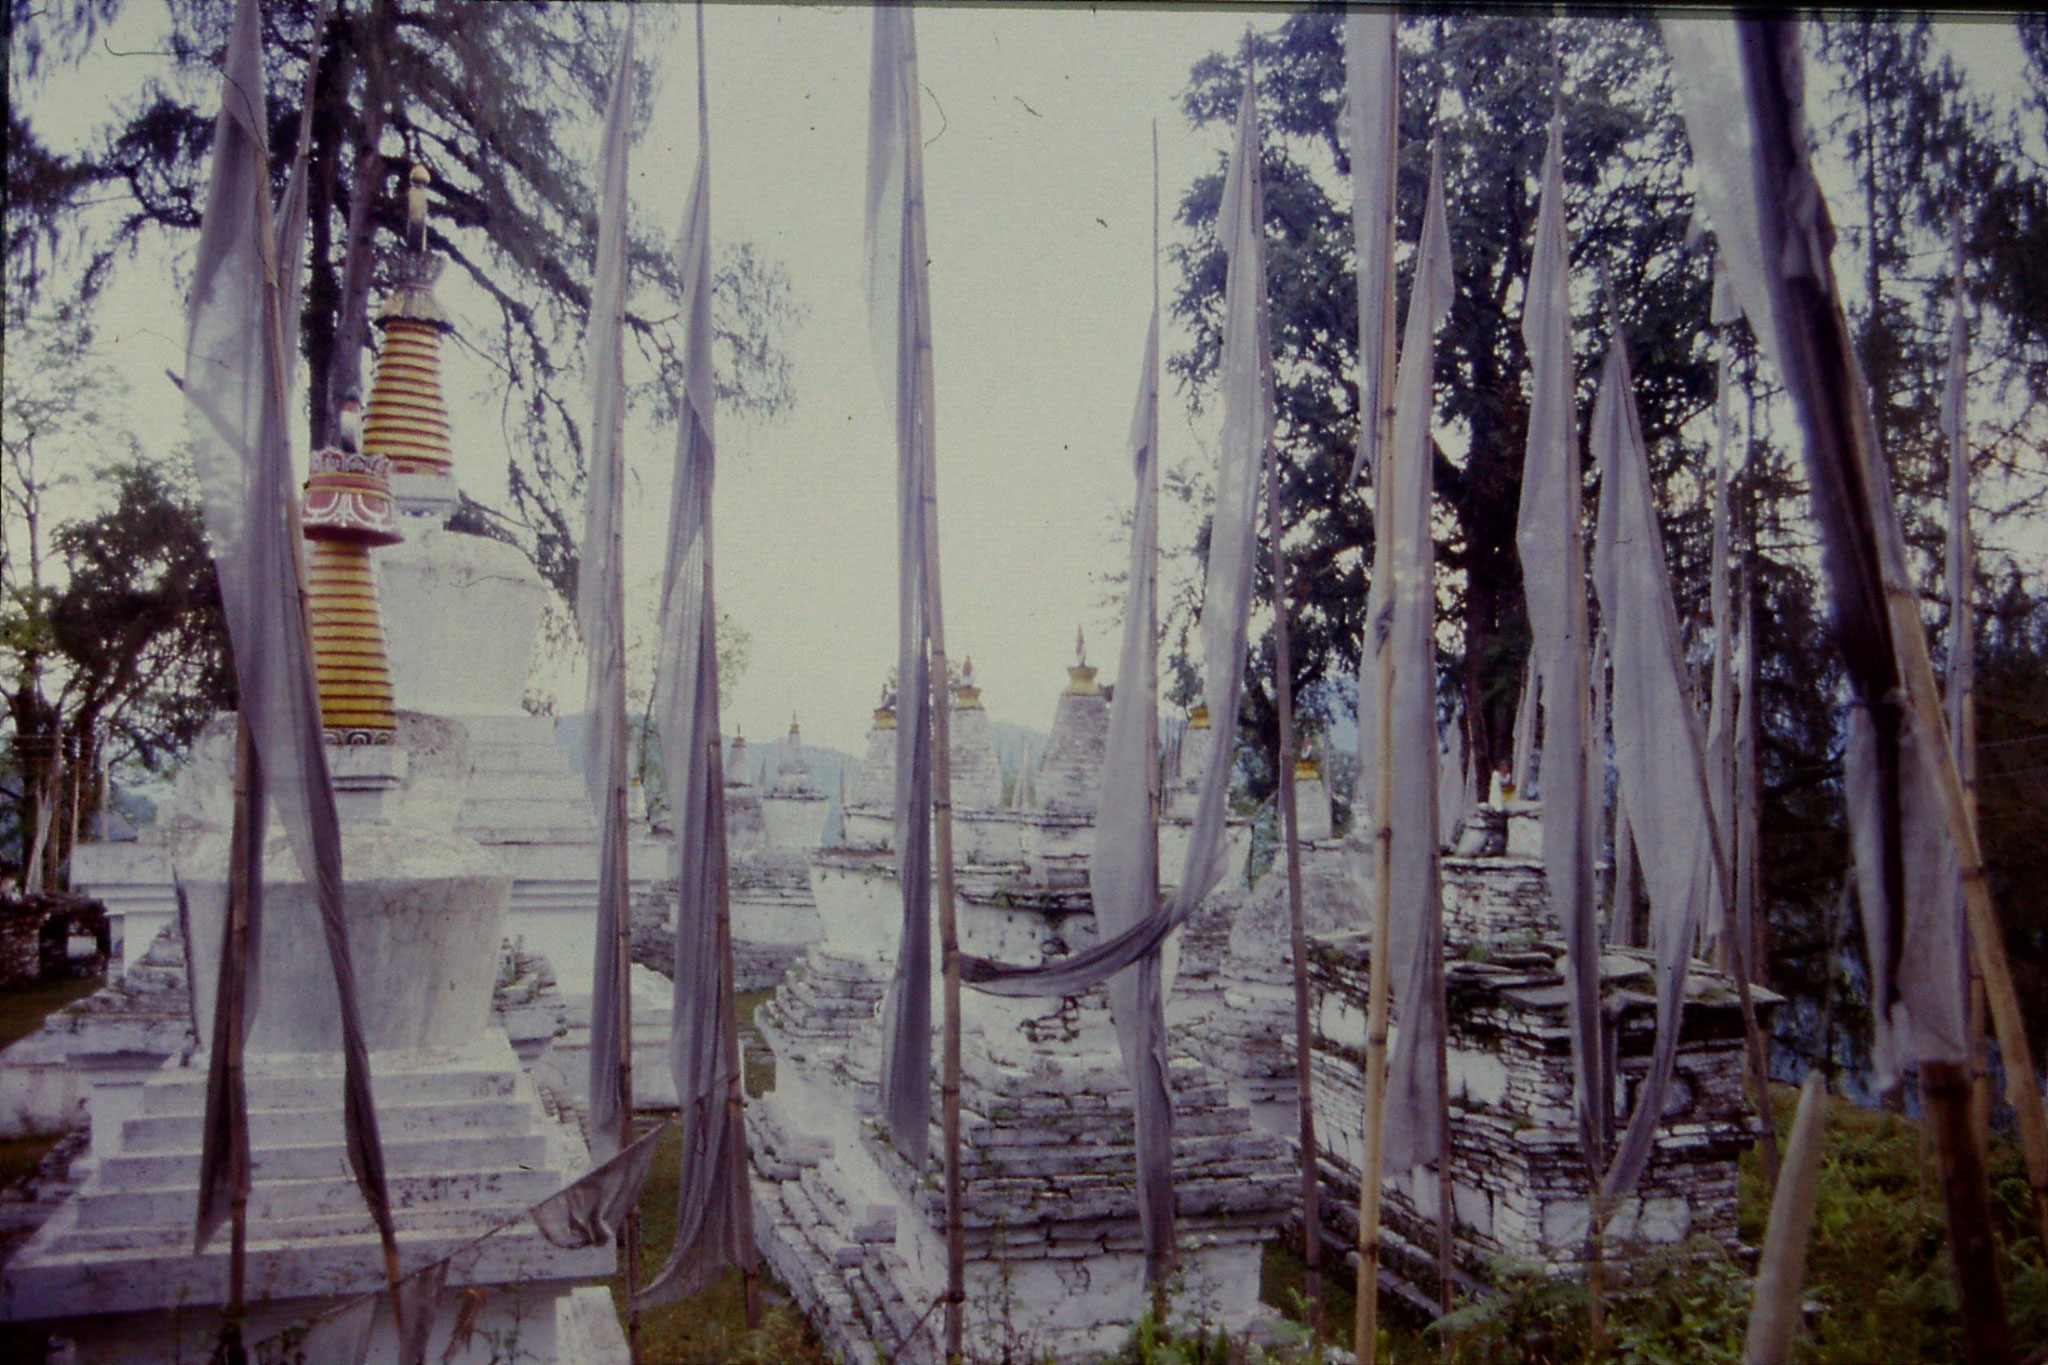 29/4/1990: 3: Tashiding gompas